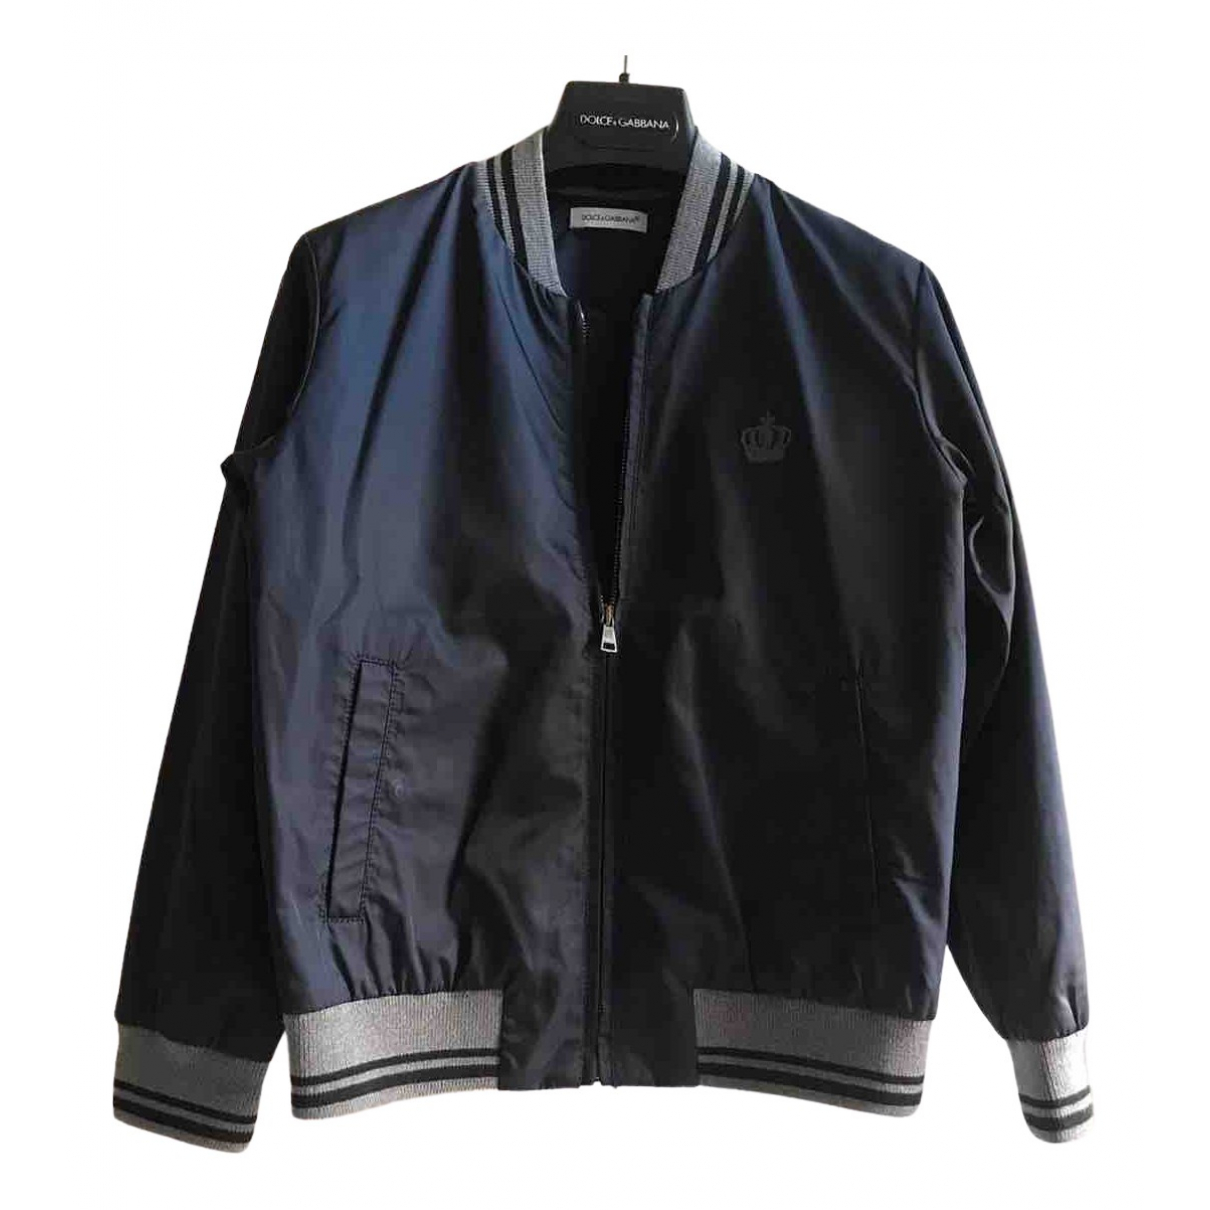 Dolce & Gabbana \N Jacke, Maentel in  Blau Polyester